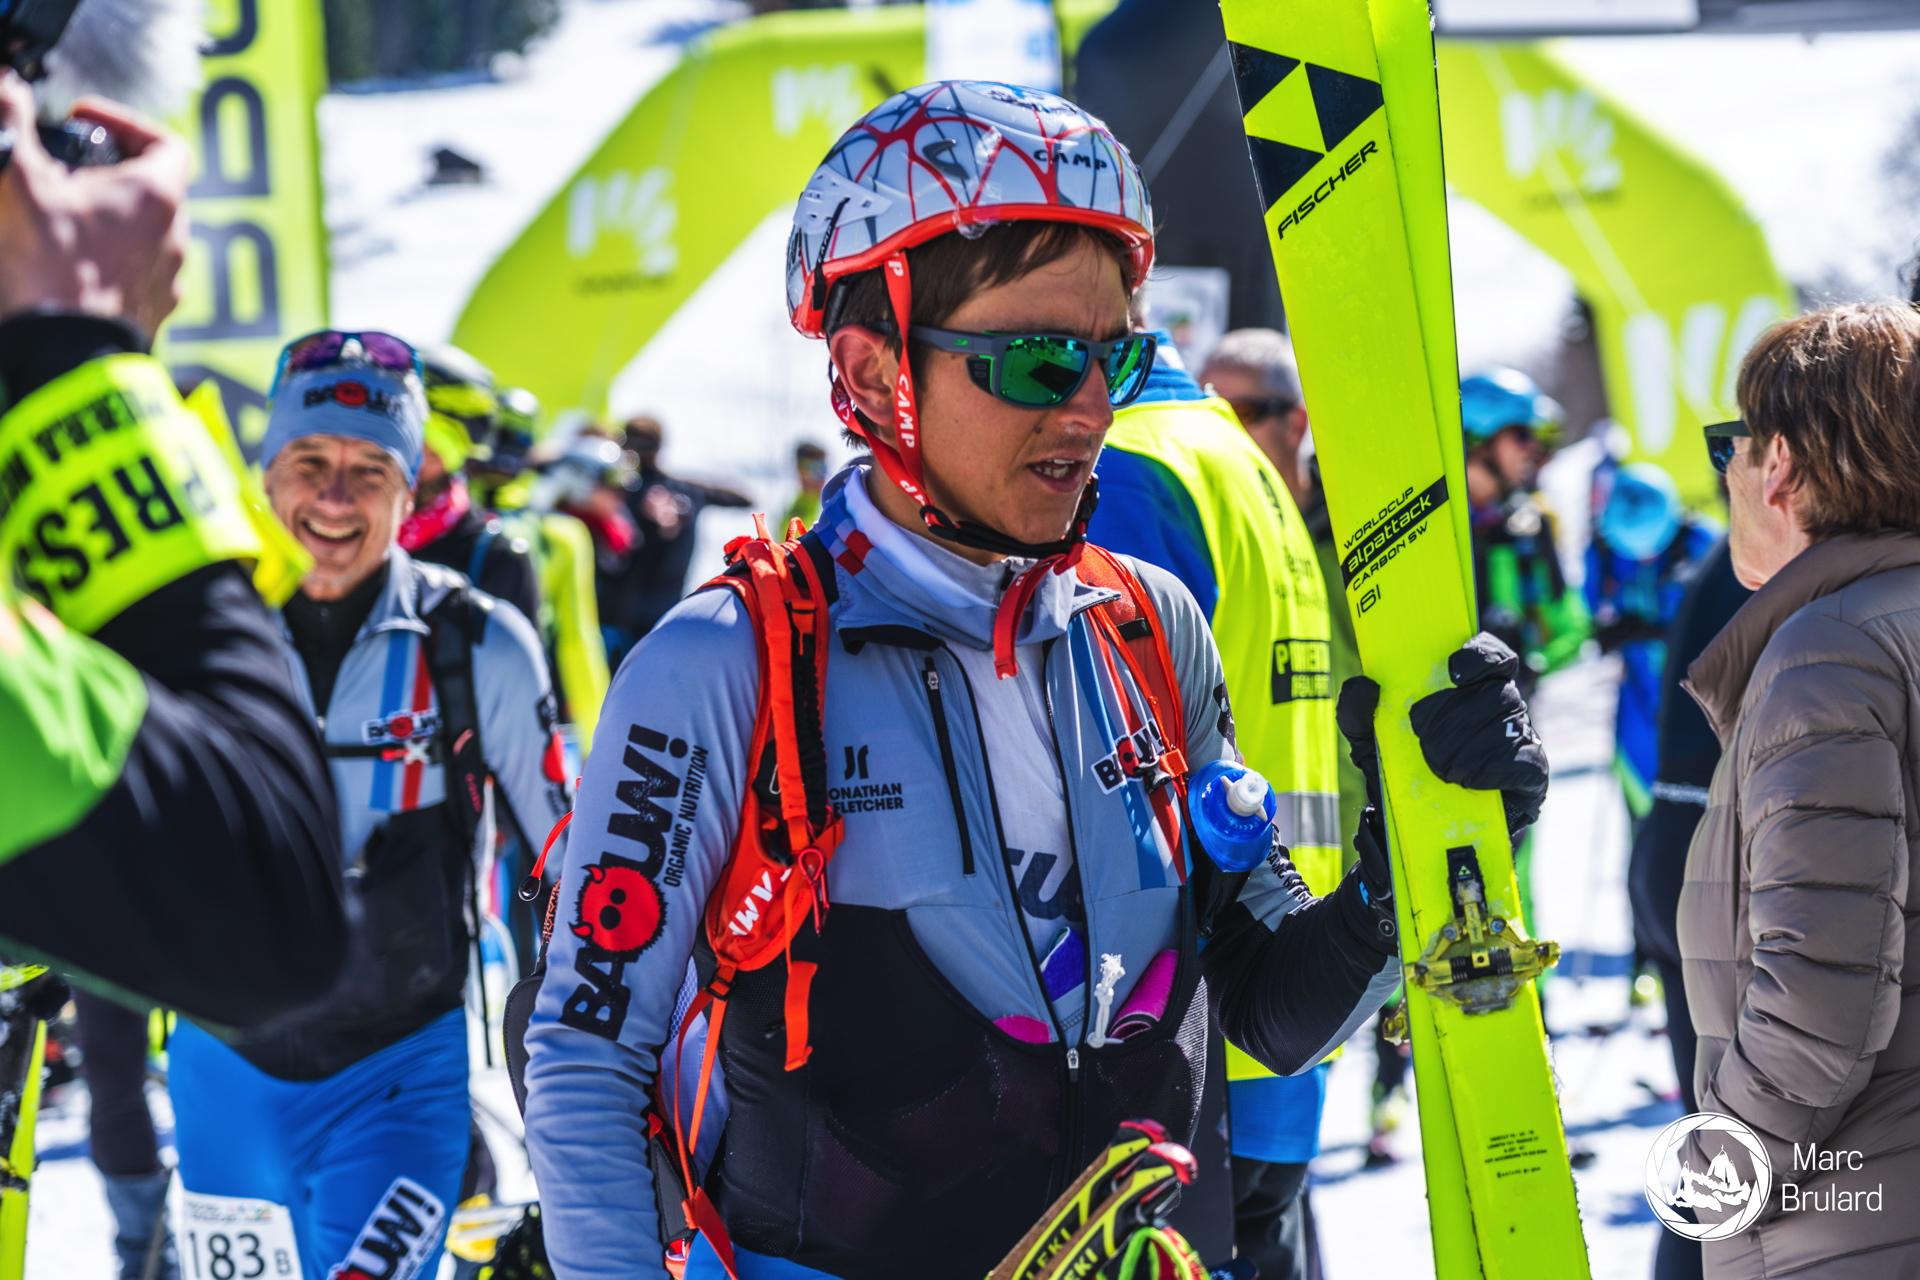 Xavier Thévenard ski-alpinisme